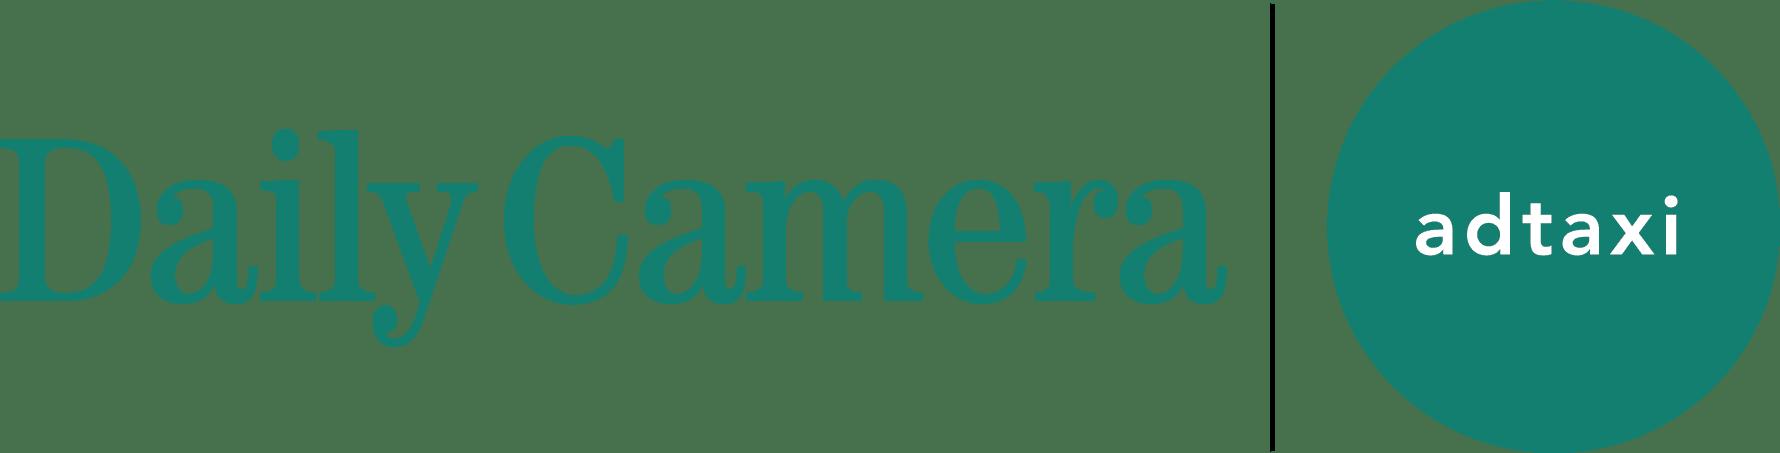 AdTaxi-DailyCamera-logo